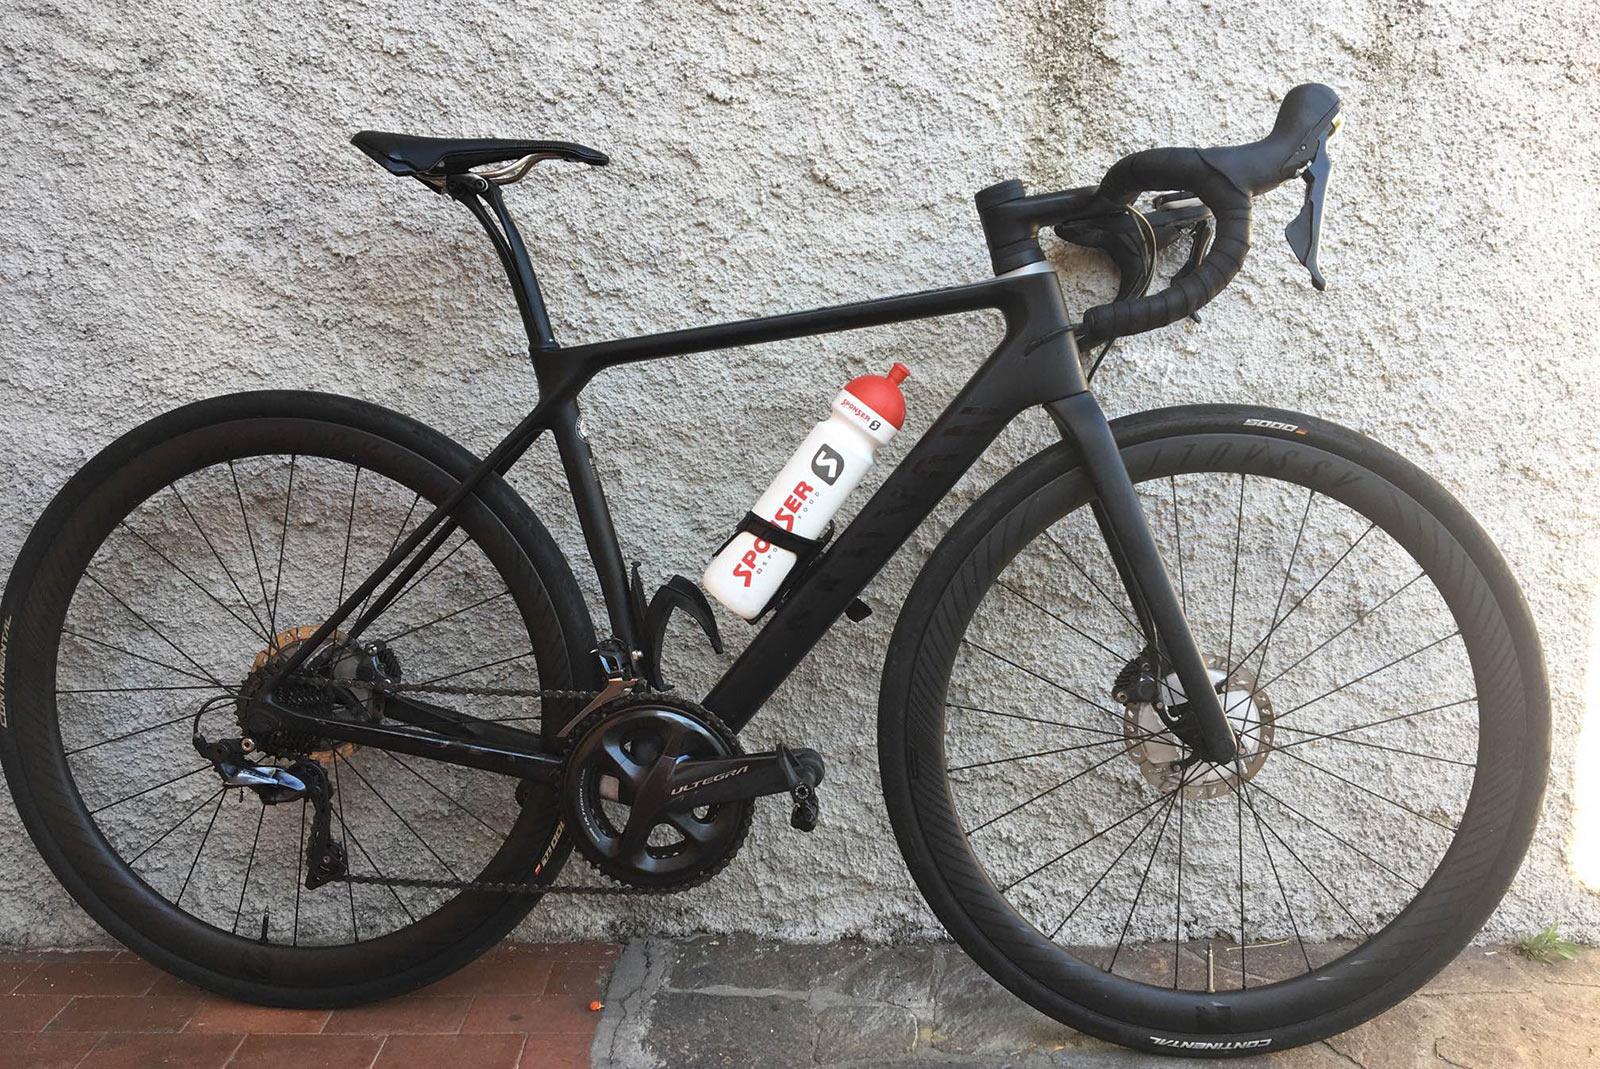 gabriele boassa everesting bike build details